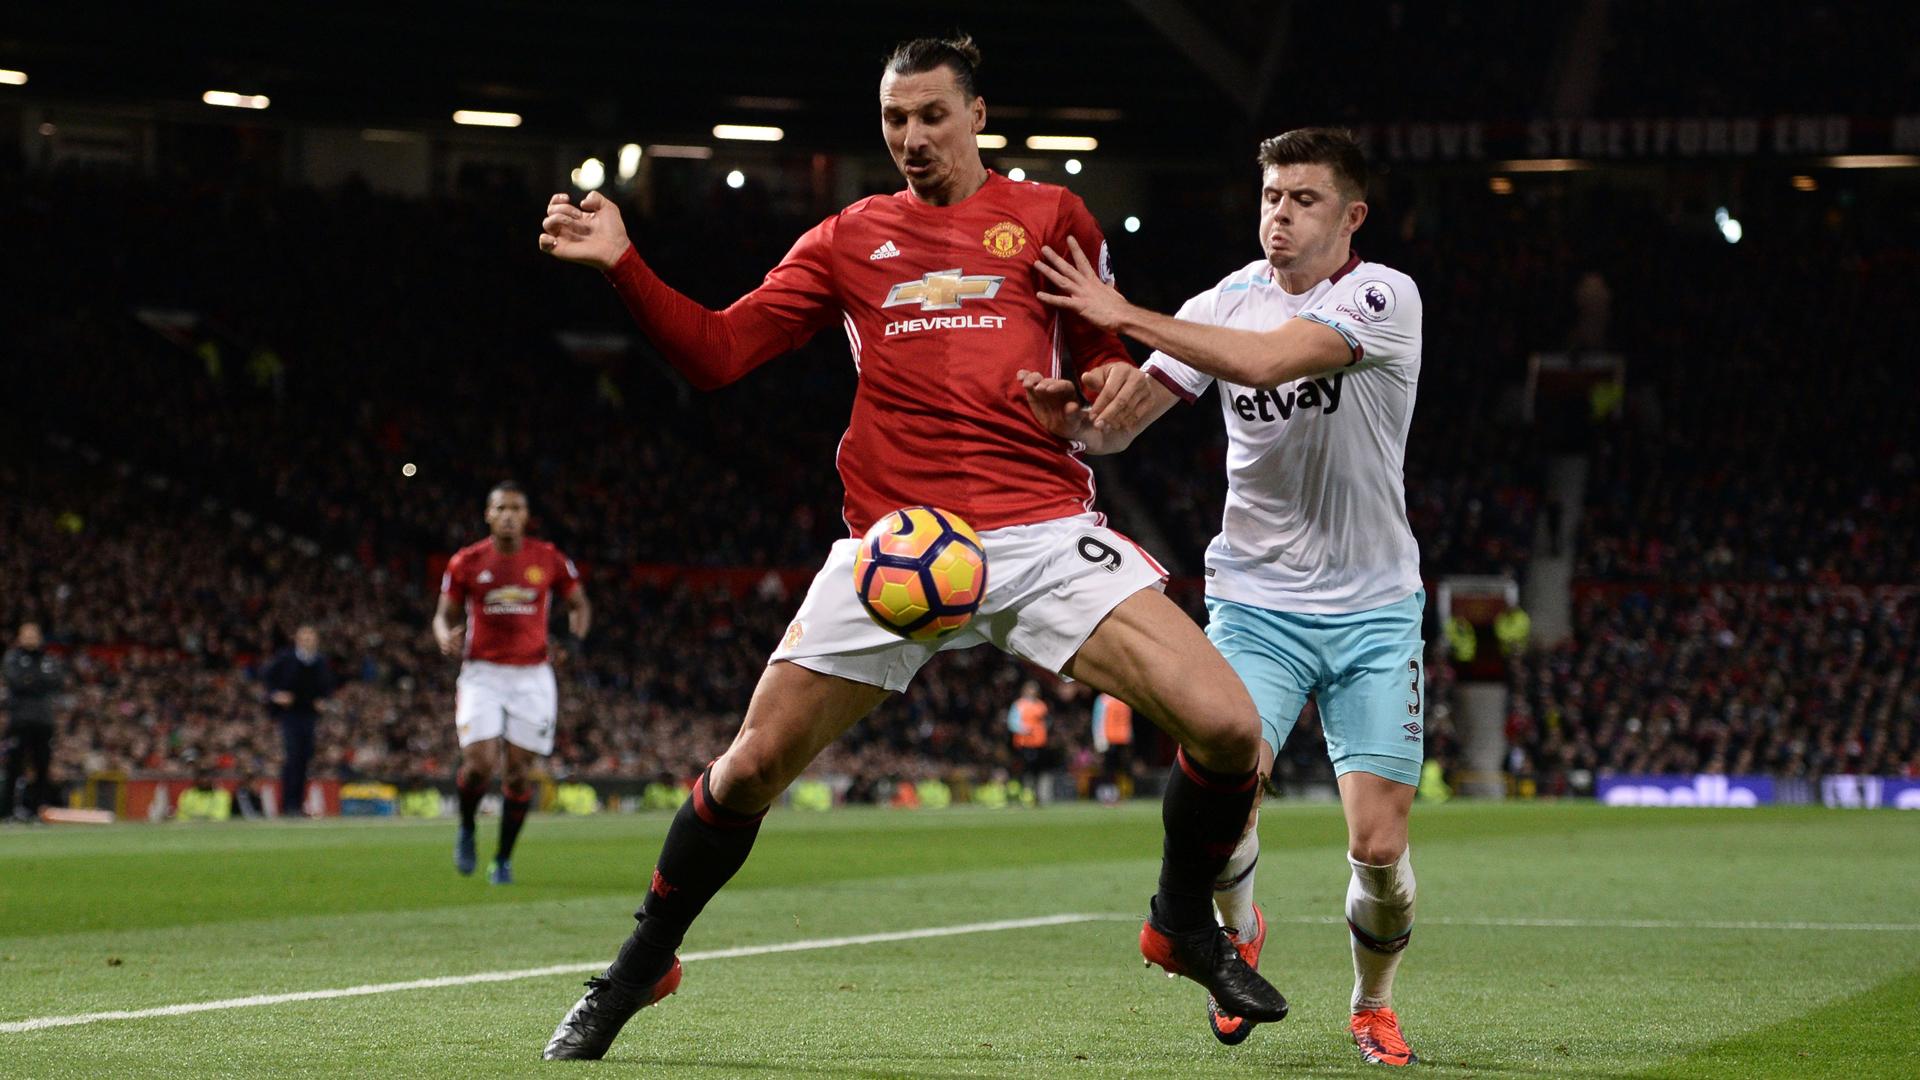 Mourinho firma el peor arranque de la historia para Manchester United